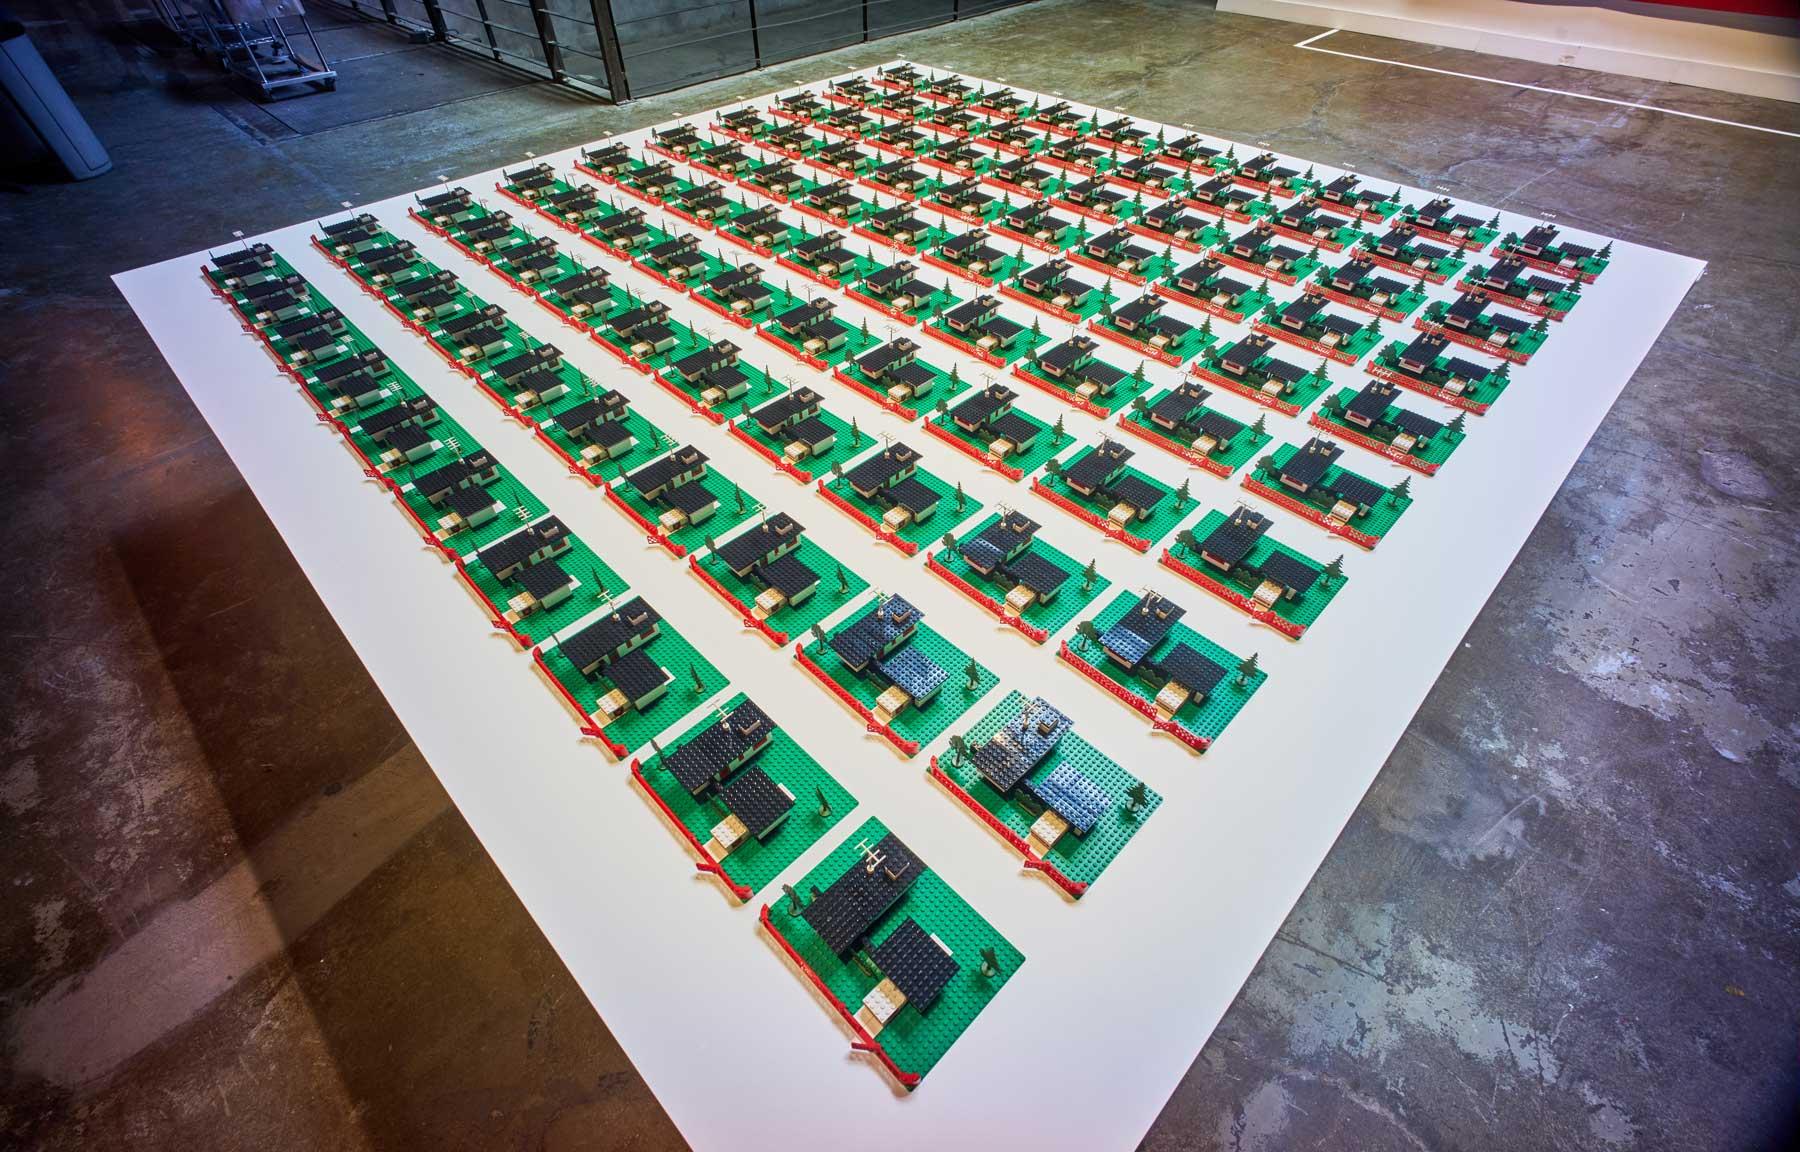 "Douglas Coupland ,  345 Modern Houses , 2014, Lego, resin, 4"" x 120"" x 90"" (10,16 x 304,8 x 228,6 cm). Photo credit: Romain Guilbault"